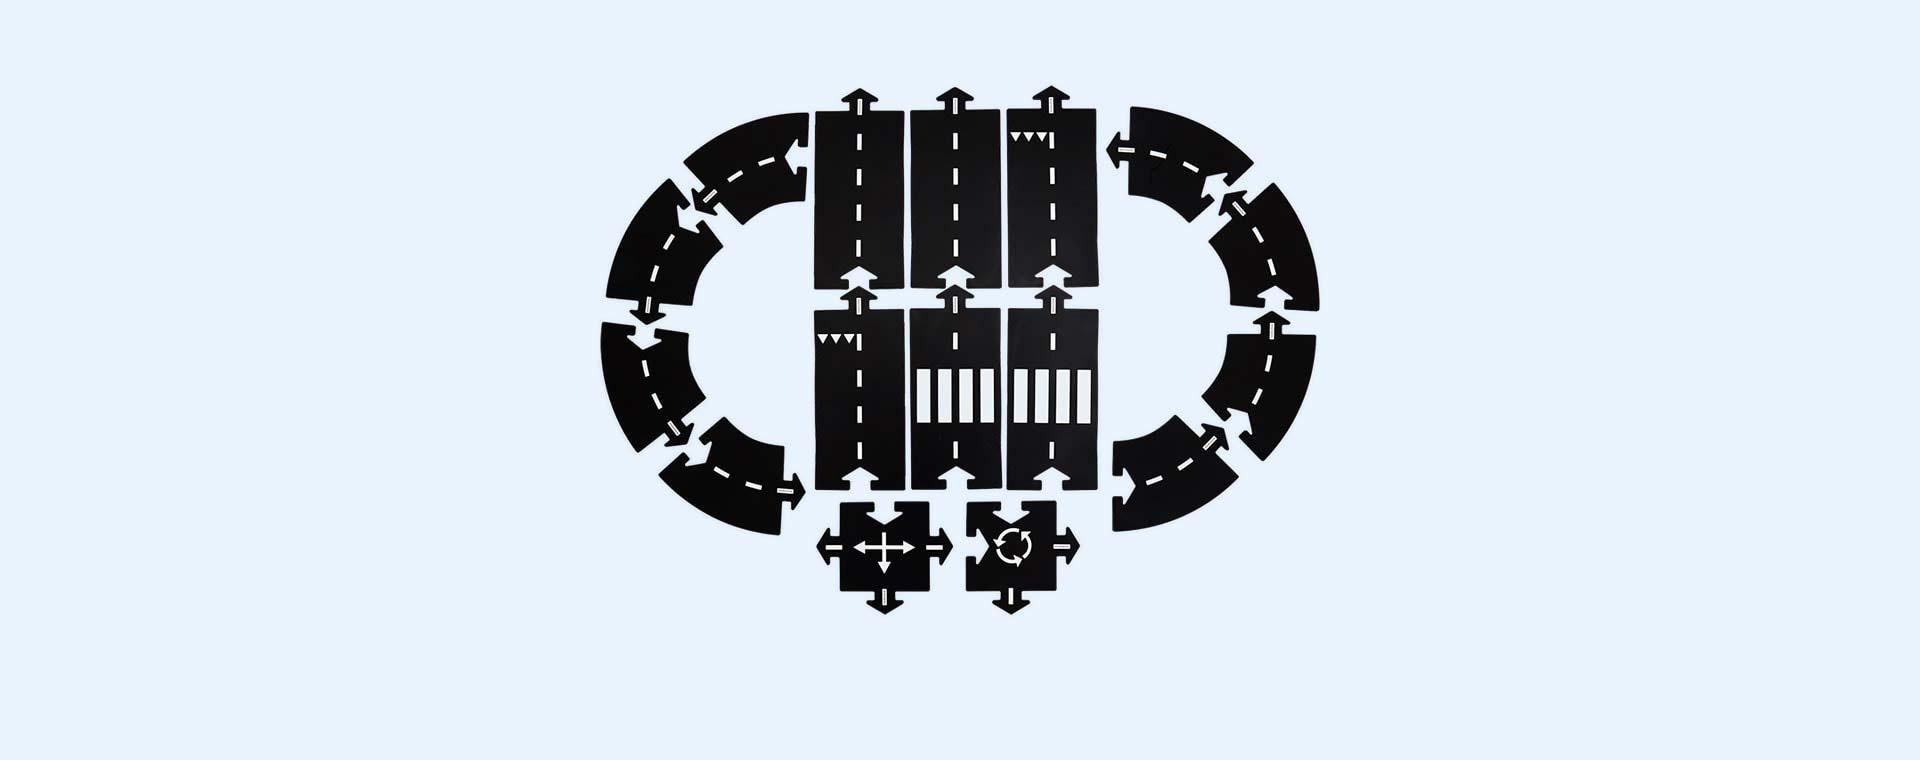 Black waytoplay Expressway 16 Piece Set